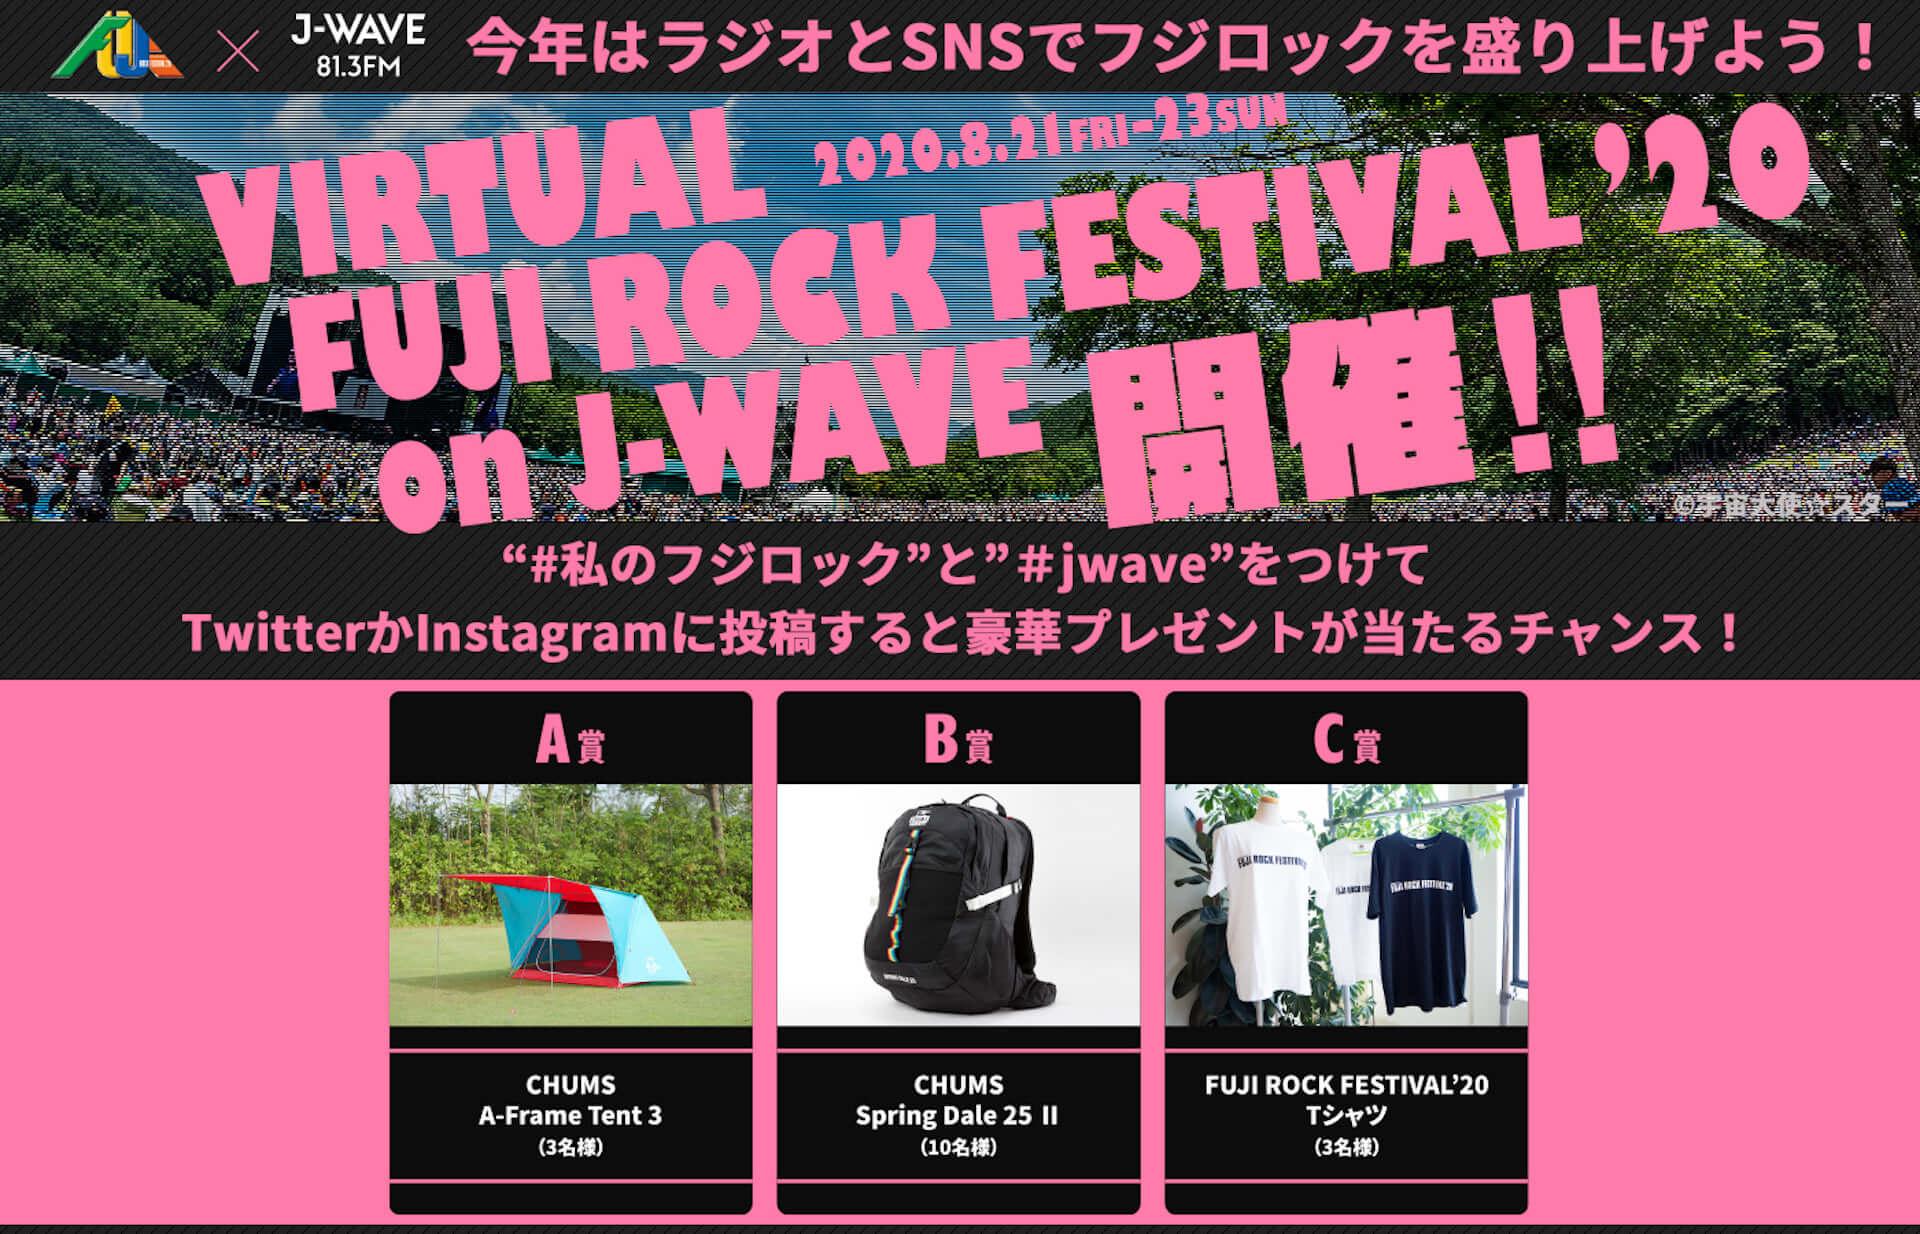 J-WAVEにて<フジロック>特集企画『VIRTUAL FUJI ROCK FESTIVAL'20 on J-WAVE』が放送決定!浅井健一、チバユウスケ、TOSHI-LOWらのコメントもオンエア music200818_fujirock-jwave_1-1920x1234